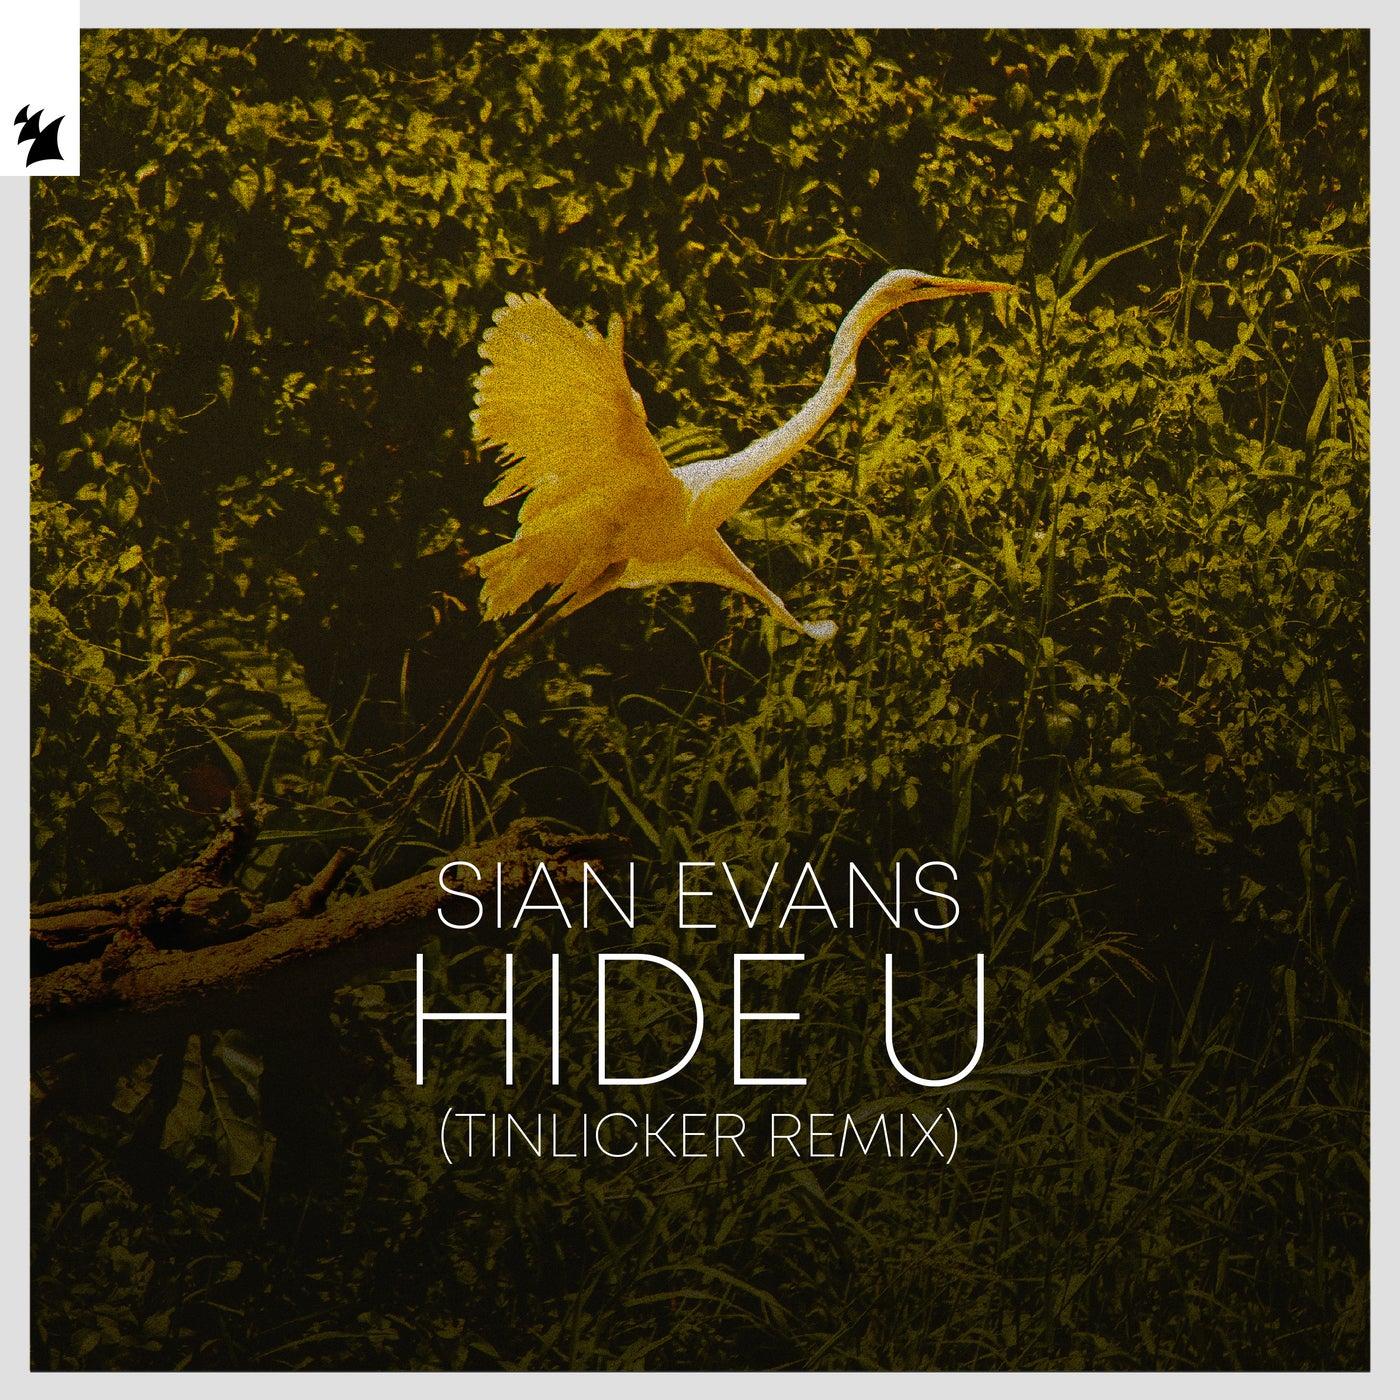 Hide U (Tinlicker Extended Remix)